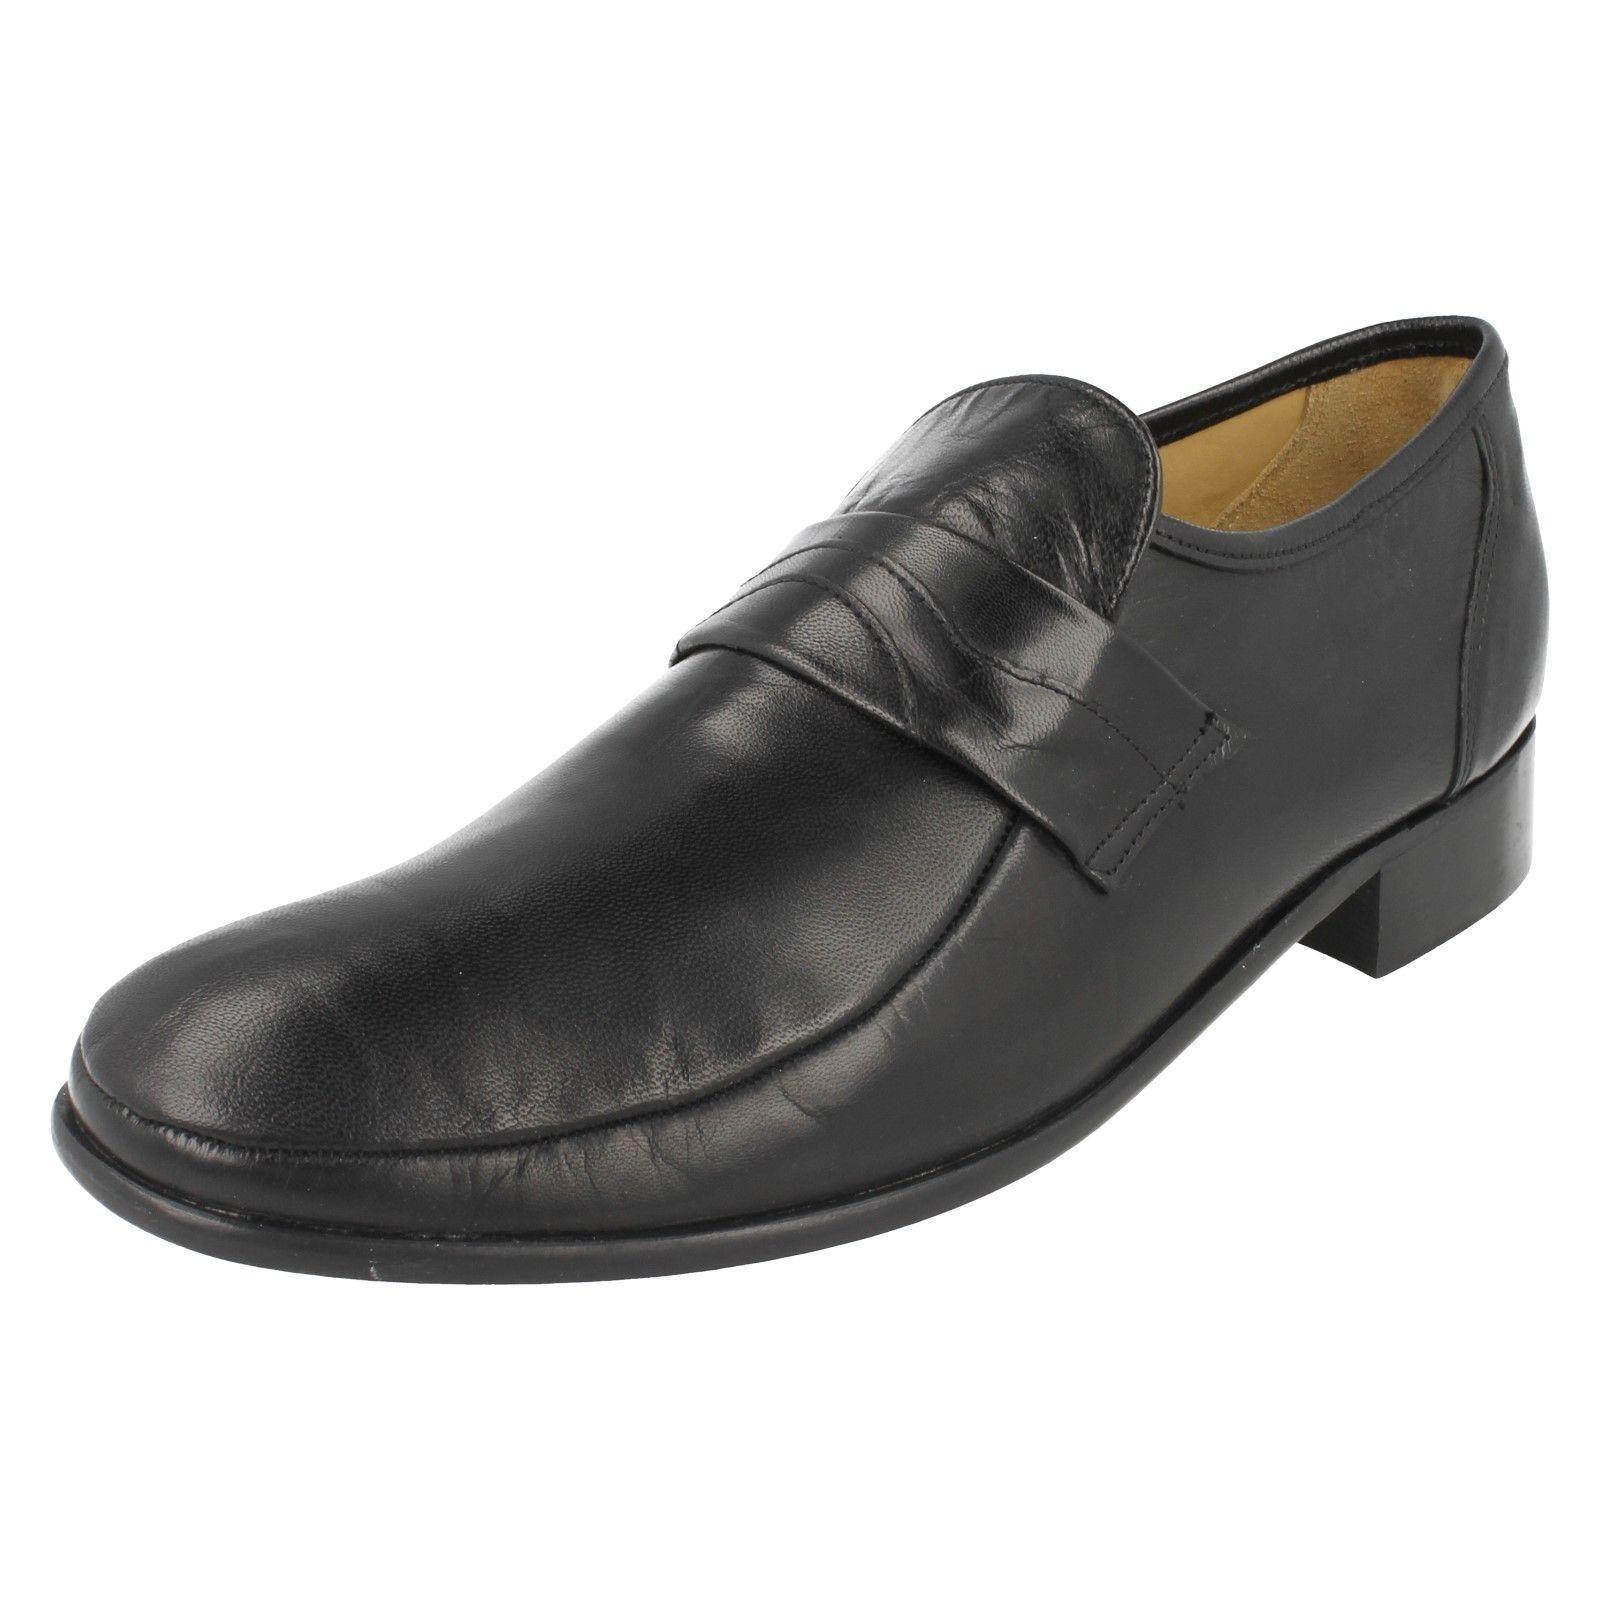 Thomas Thomas Thomas Blaunt Swindon Leather Mens Slip On schuhe adc865